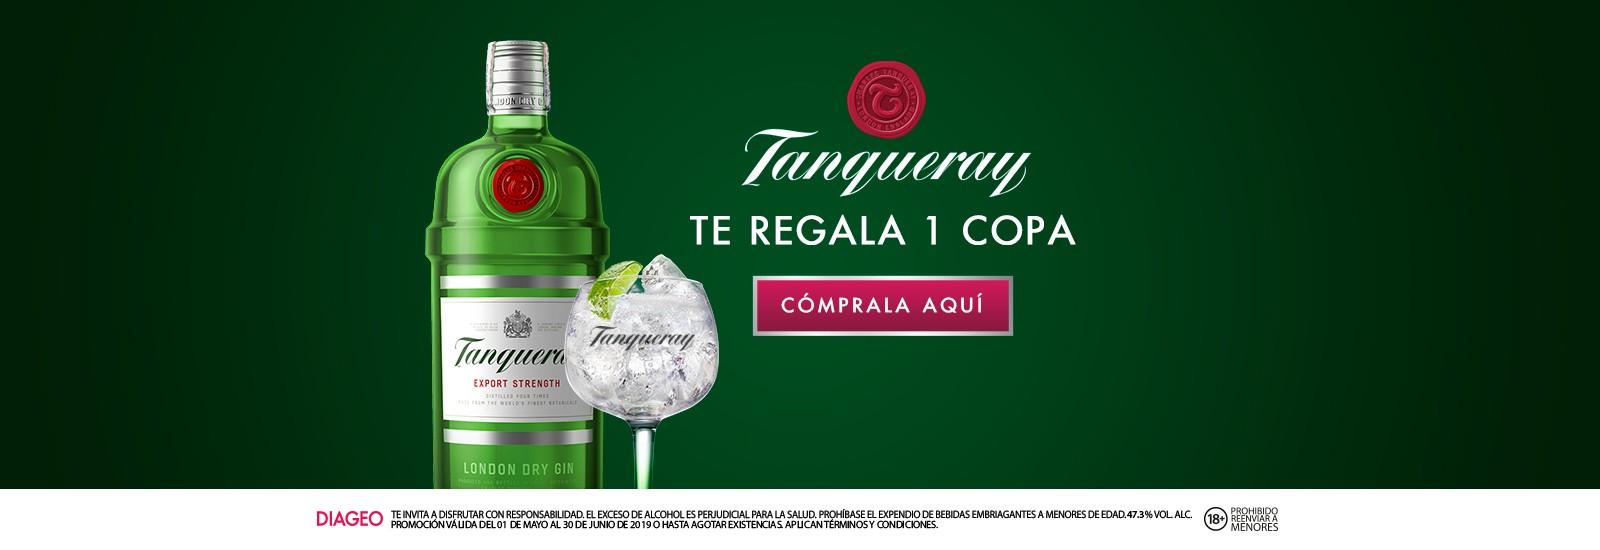 TANQUERAY + COPA